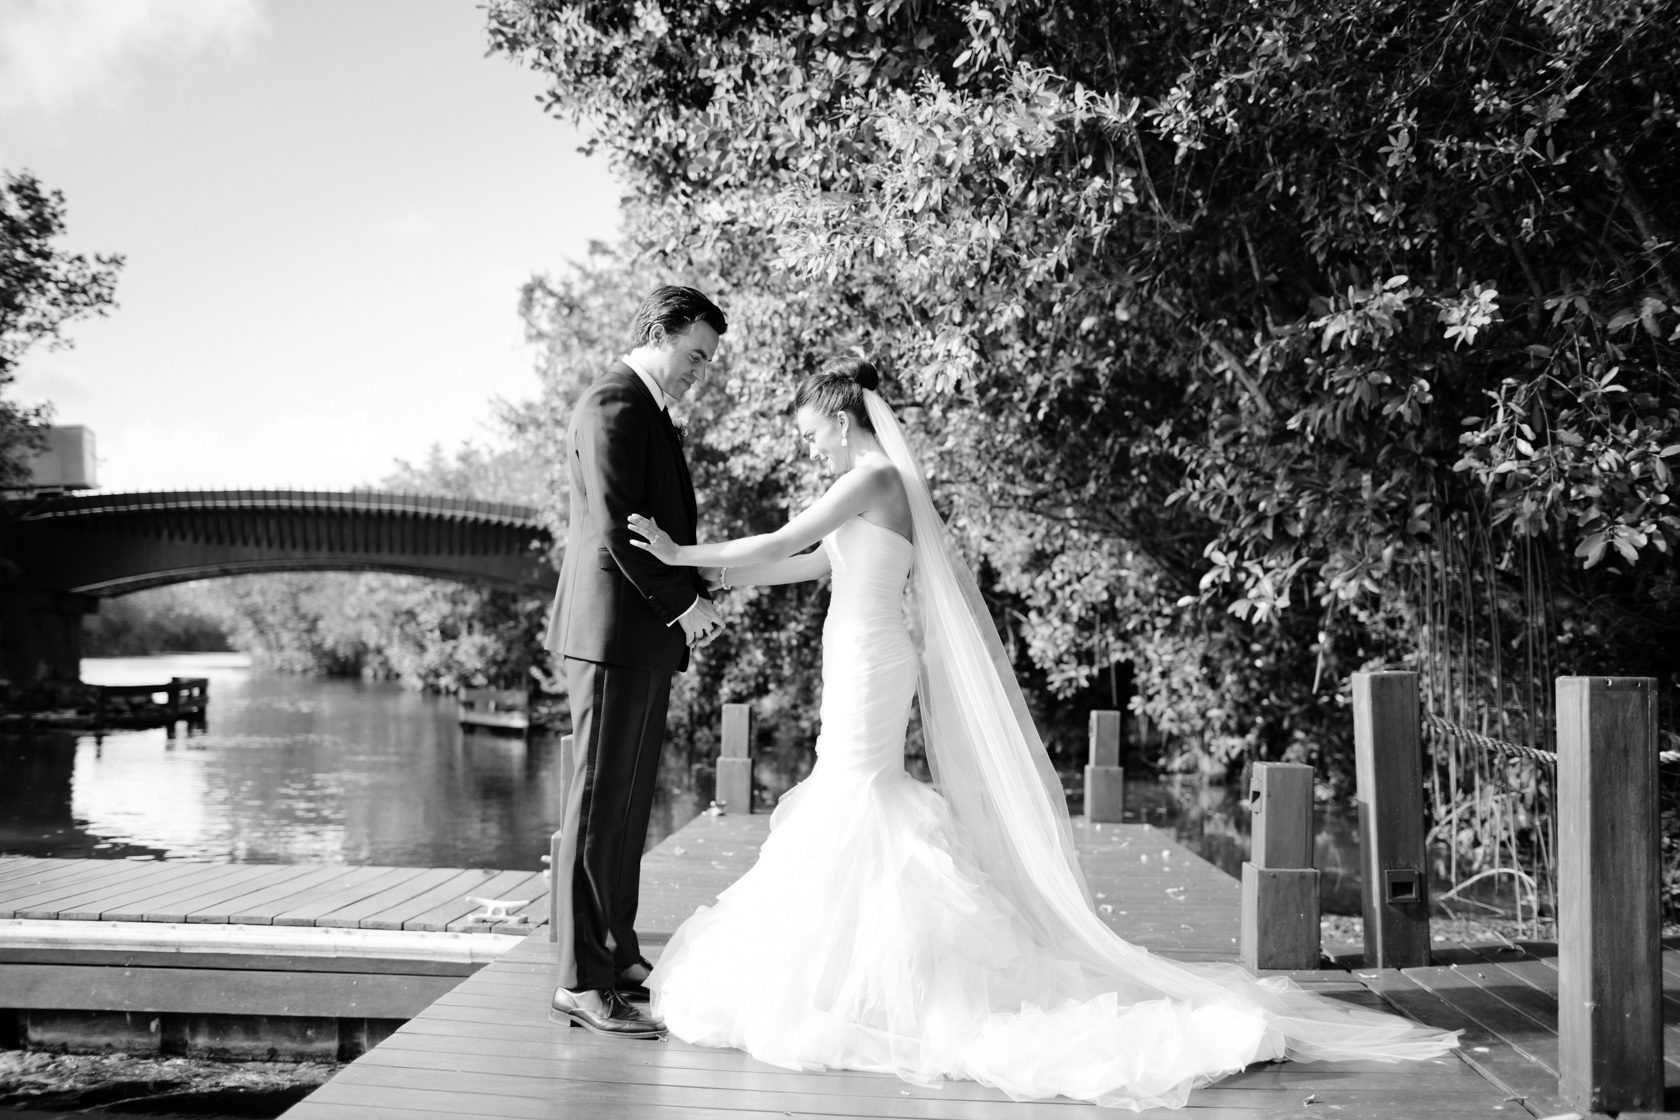 Fairmont_Mayakoba_Wedding_026-1680x1120.jpg